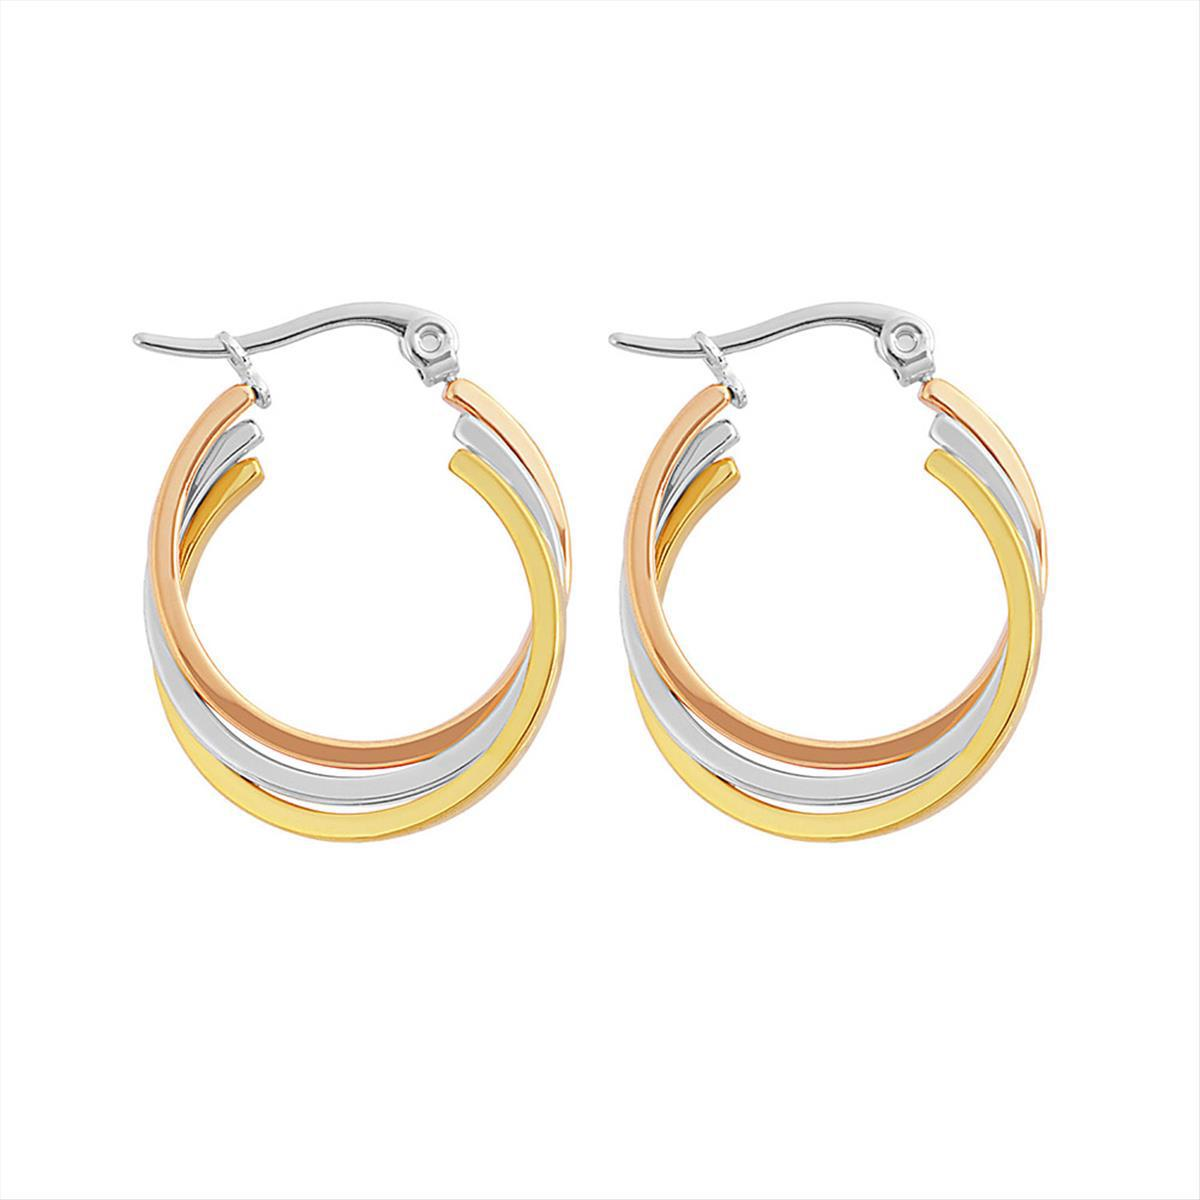 Boucles d'oreilles Edforce - 353-0121-E - Modalova